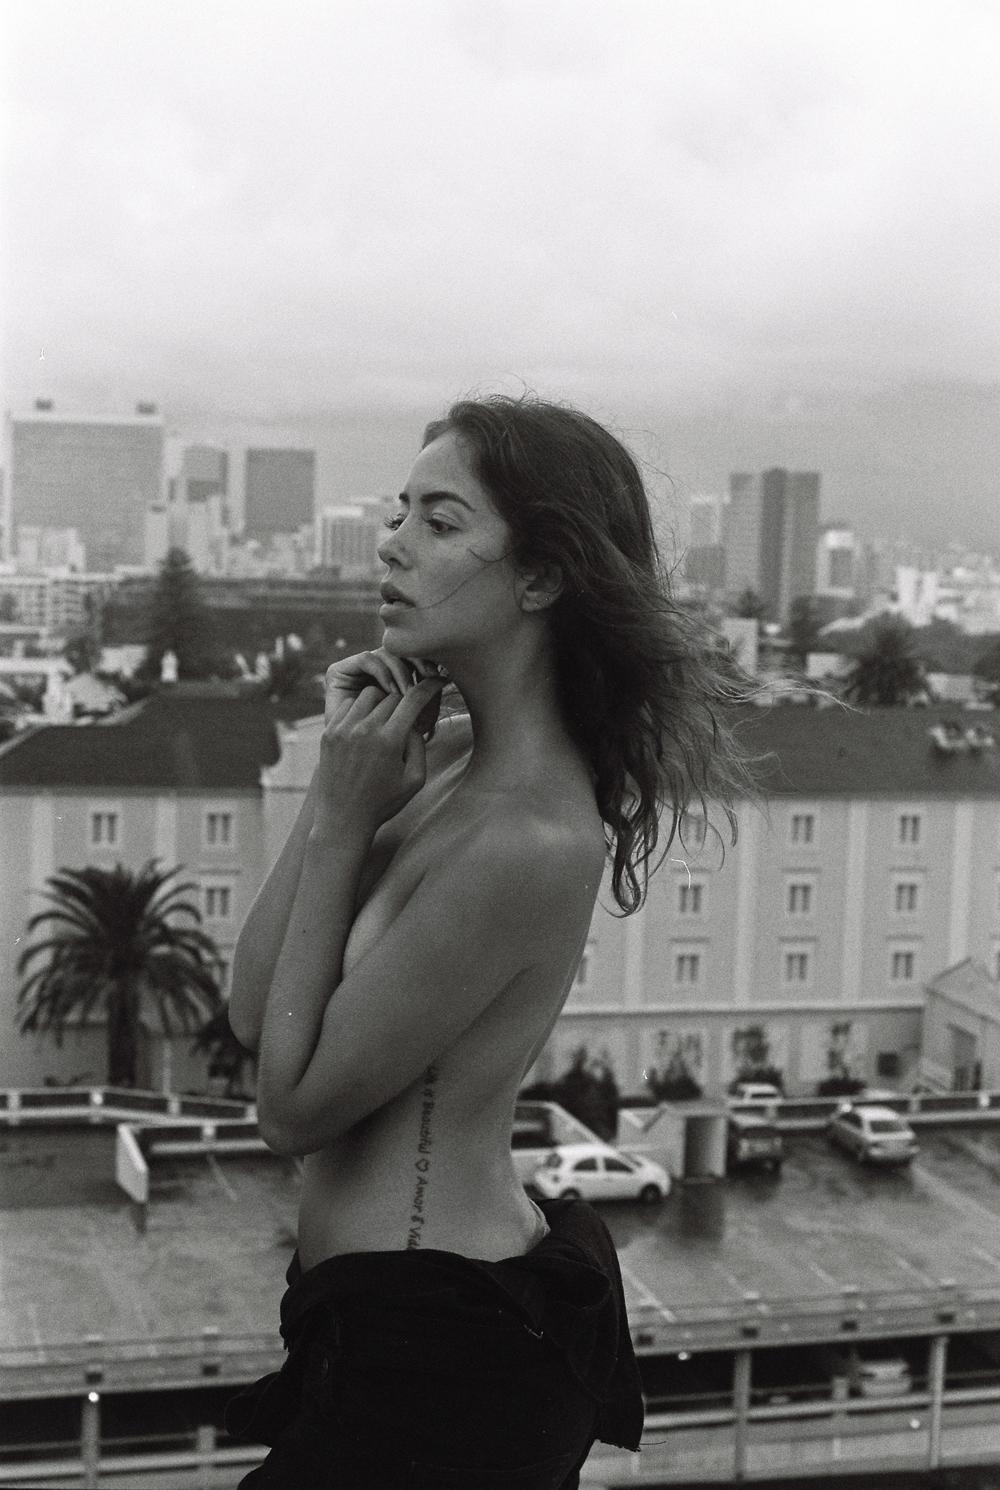 Viktoria Summer by Aidan Tobias